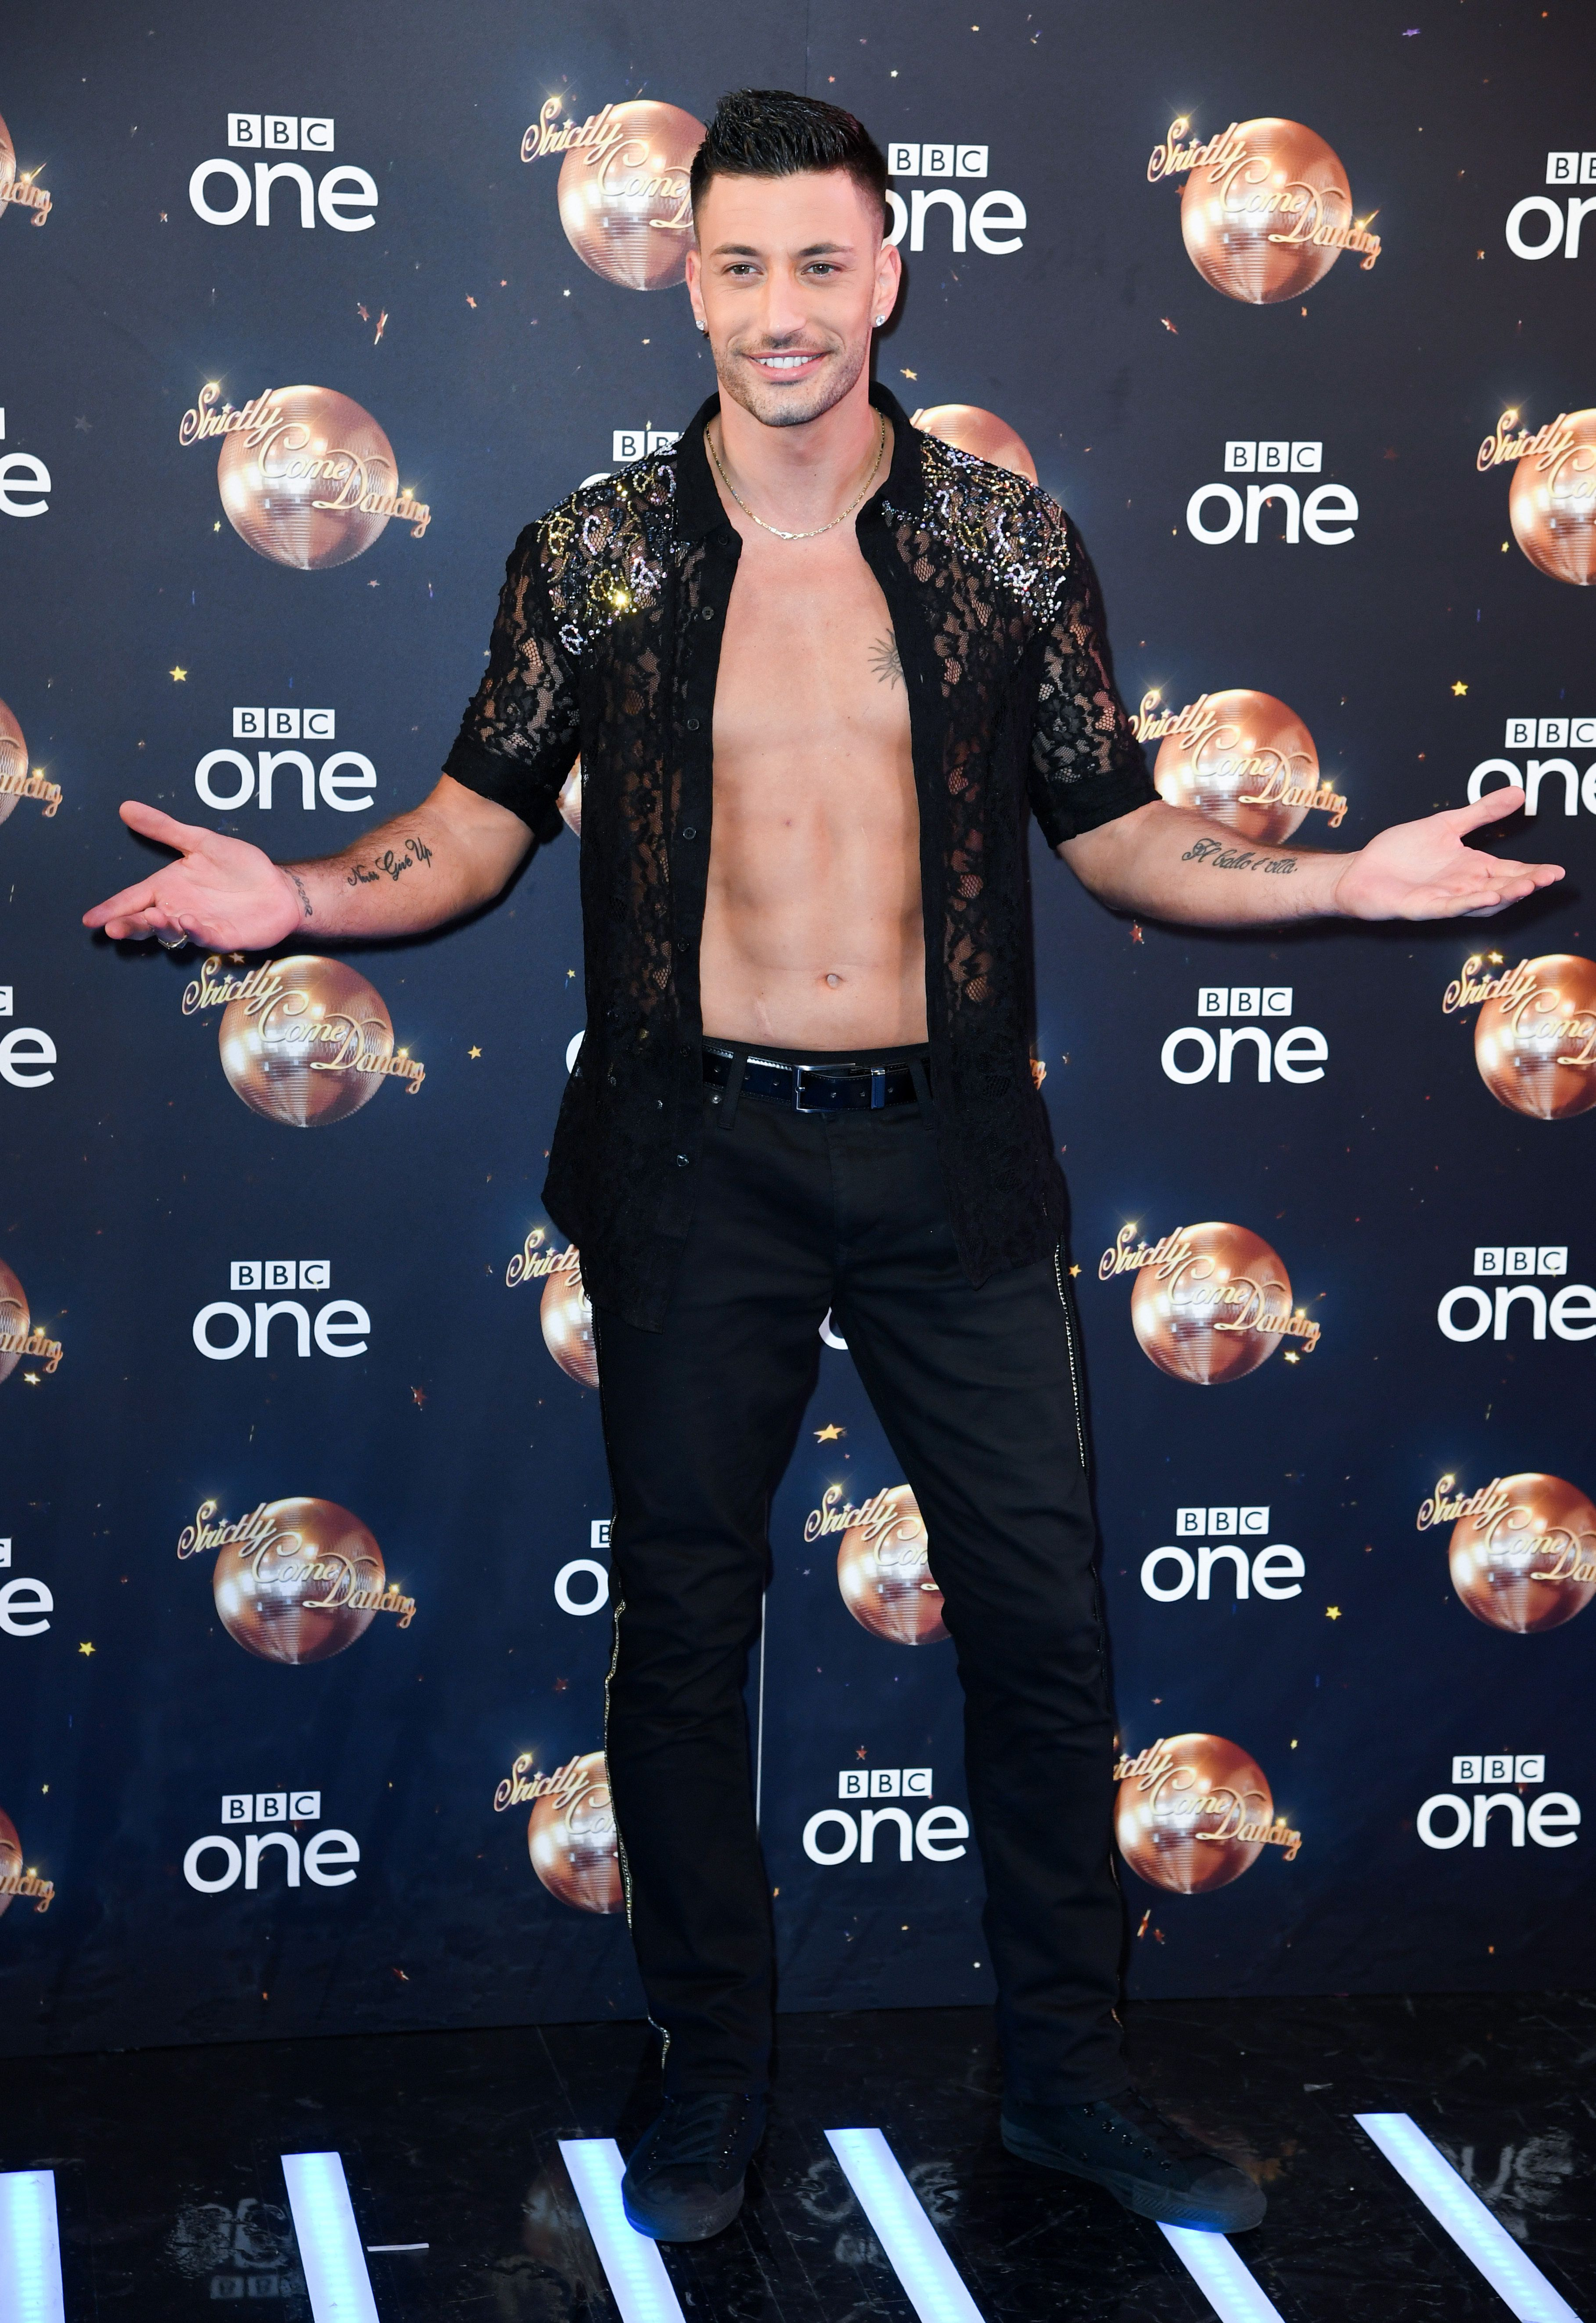 DENIAL: Strictly Come Dancing's Giovanni Pernice Hits Back At Gleb Savchenko Over 'Nonsense' Romance